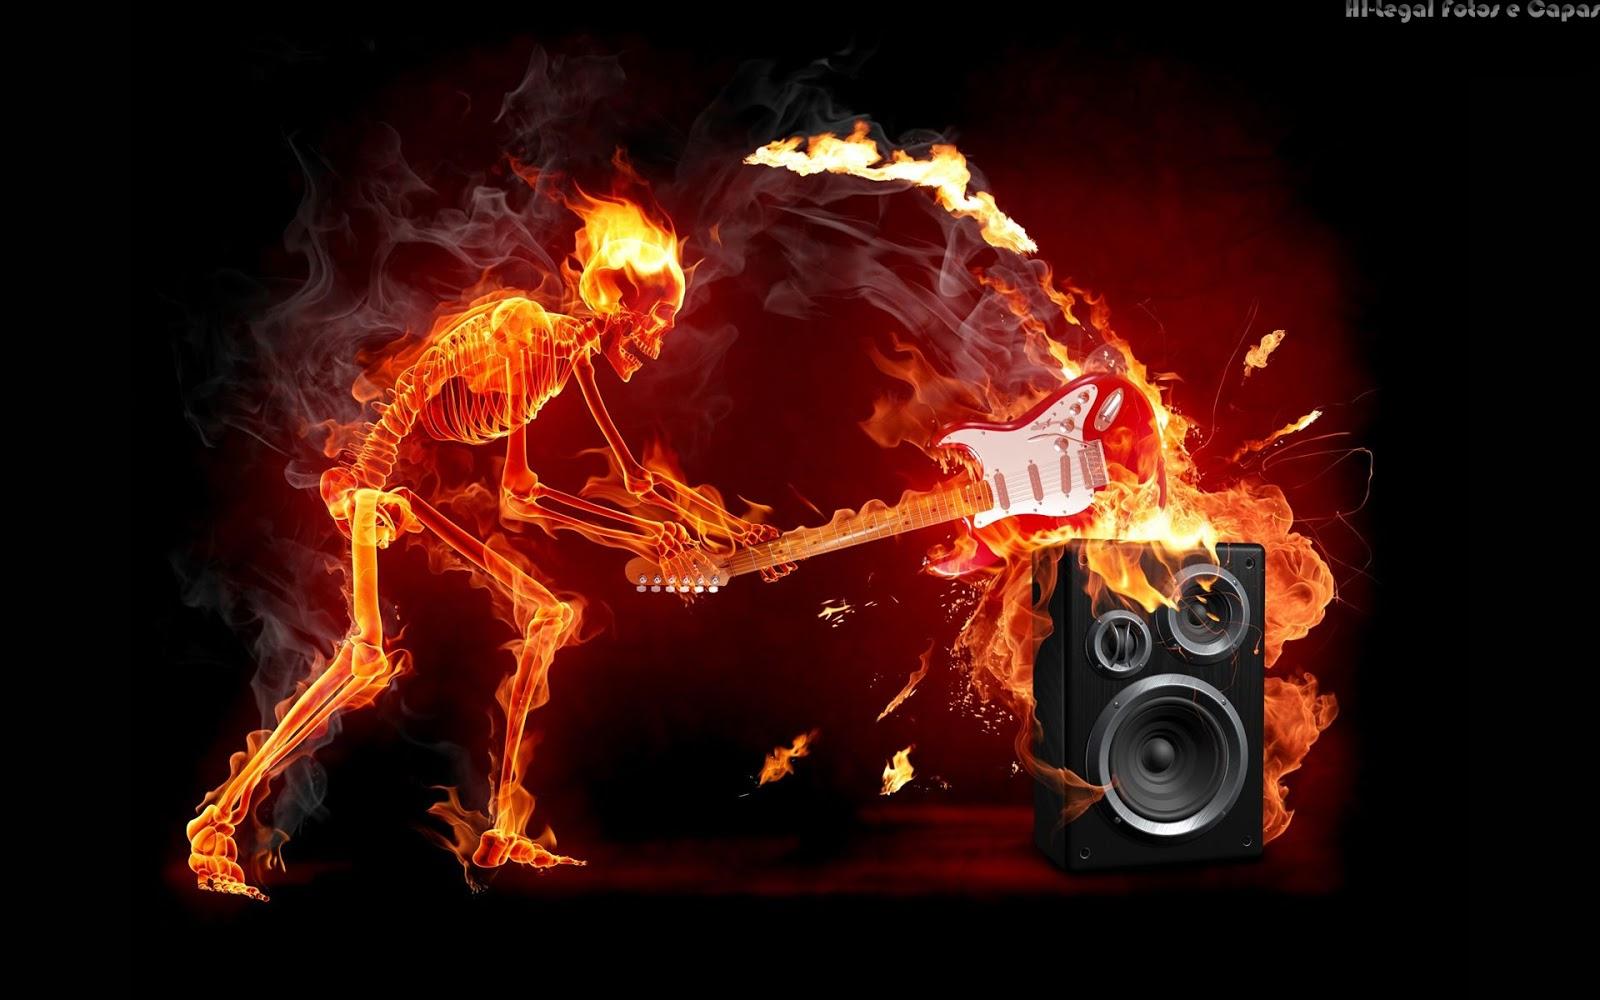 http://2.bp.blogspot.com/-iifPudxz1Mg/UKbpnpLHV_I/AAAAAAAAFss/GT34Hul38ko/s1600/caveira+de+fogo+quebrando+guitarra+BY+HI-Legal+Fotos+e+Capas.jpg